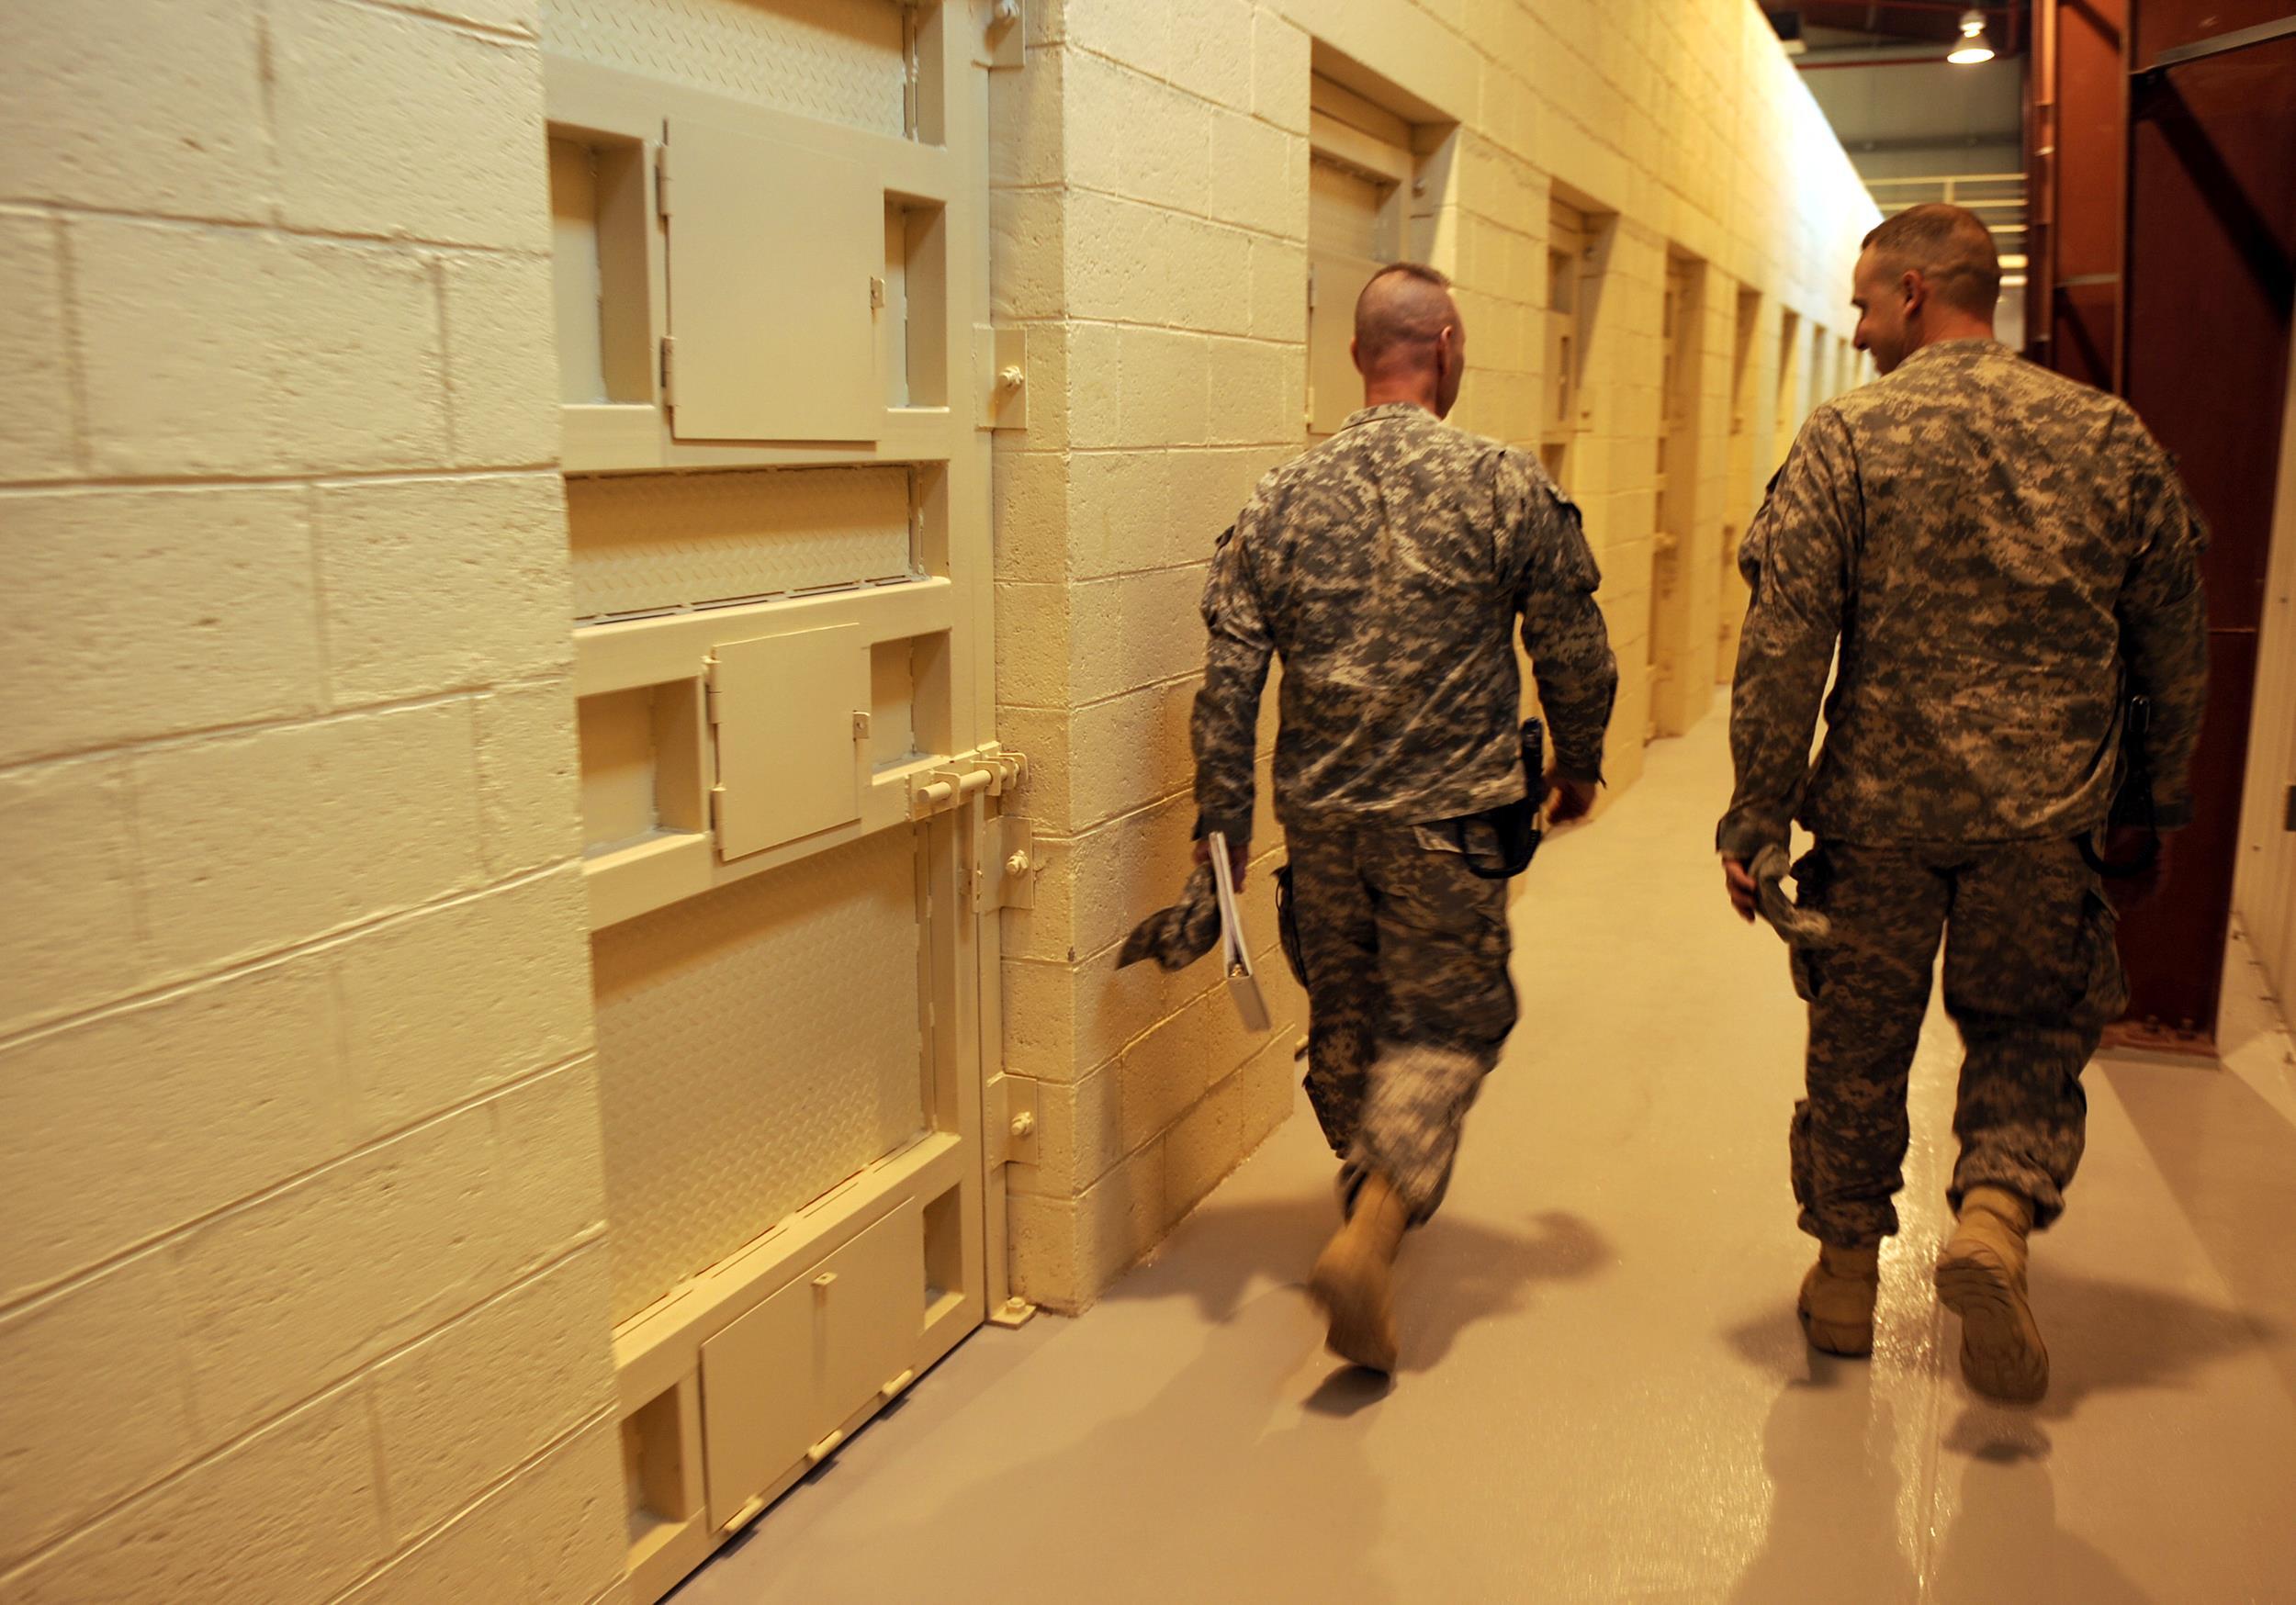 Image: U.S. soldiers walk past prison cells during a media tour of Bagram prison, north of Kabu